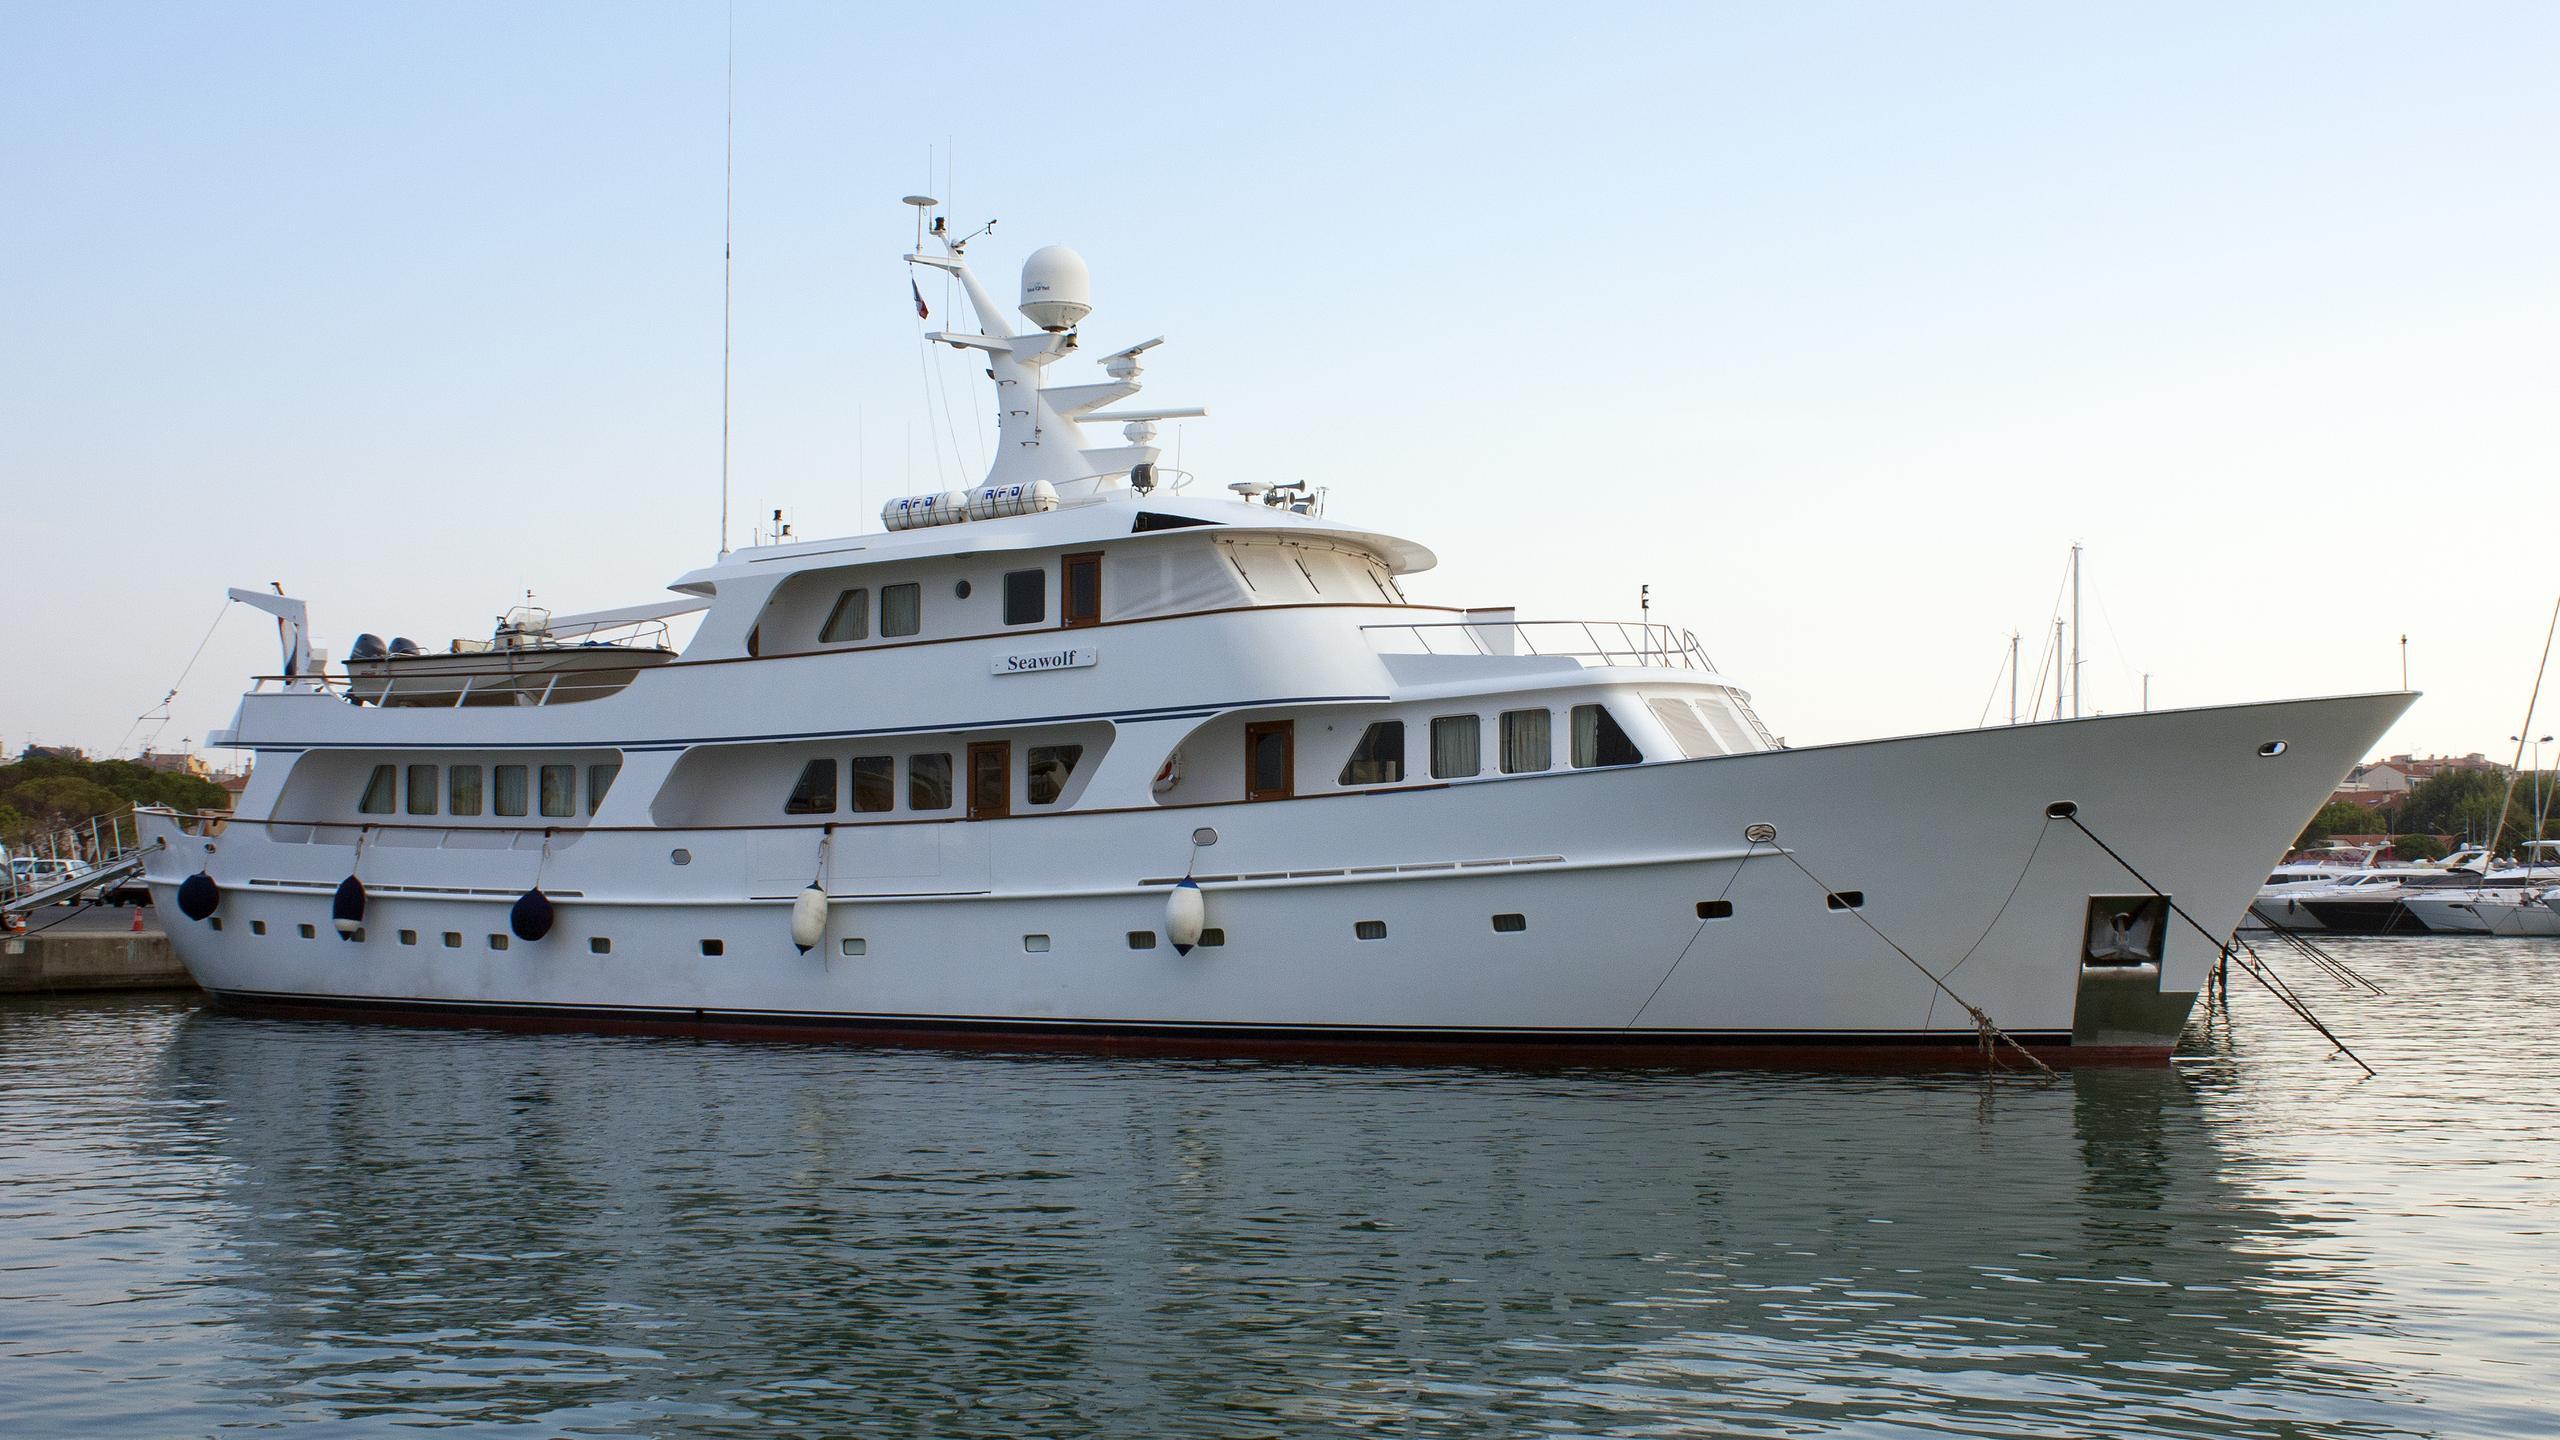 seawolf-motor-yacht-haak-1987-38m-half-profile